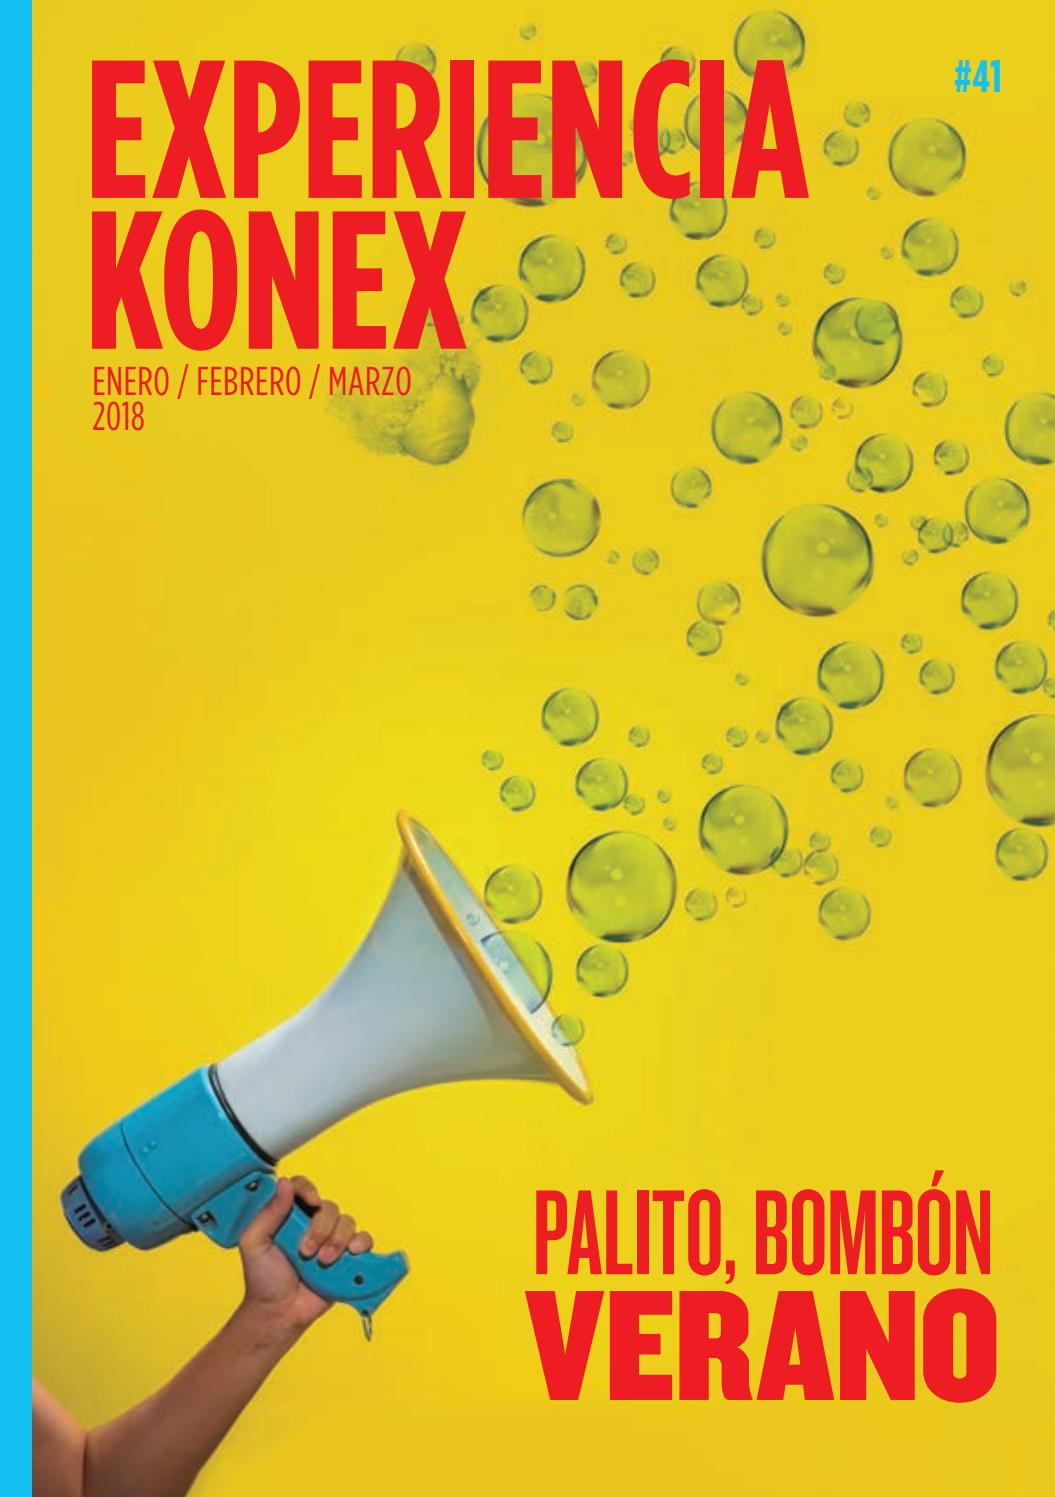 Experiencia Konex #41 by Ciudad Cultural Konex - issuu